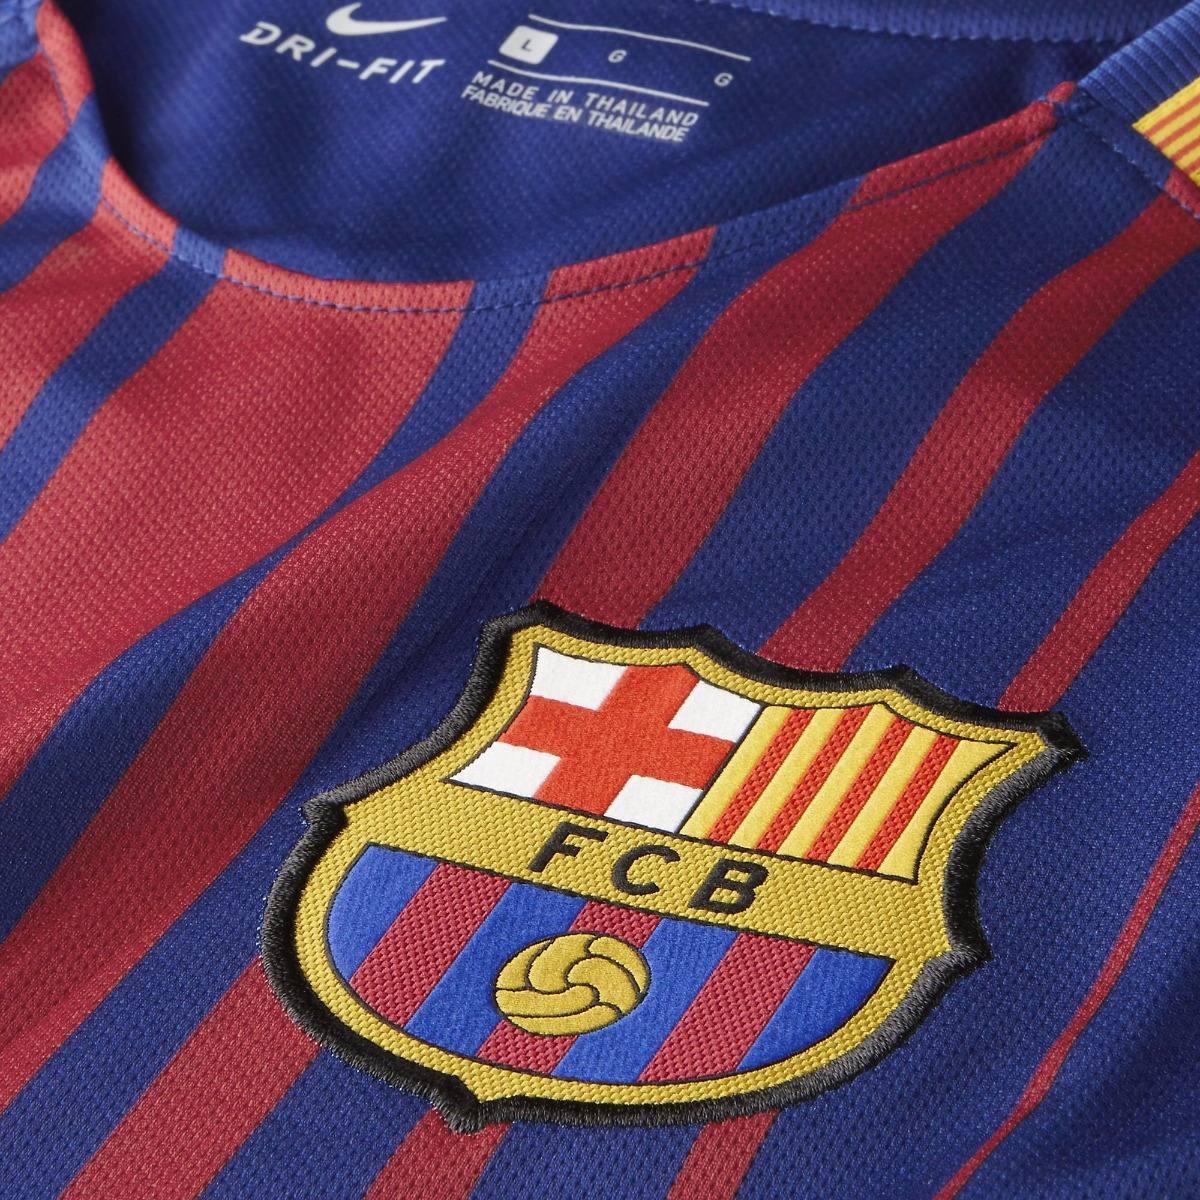 camisa barcelona home 17 18 s nº breathe -torcedor nike masc. Carregando  zoom. 03bc0efc41621